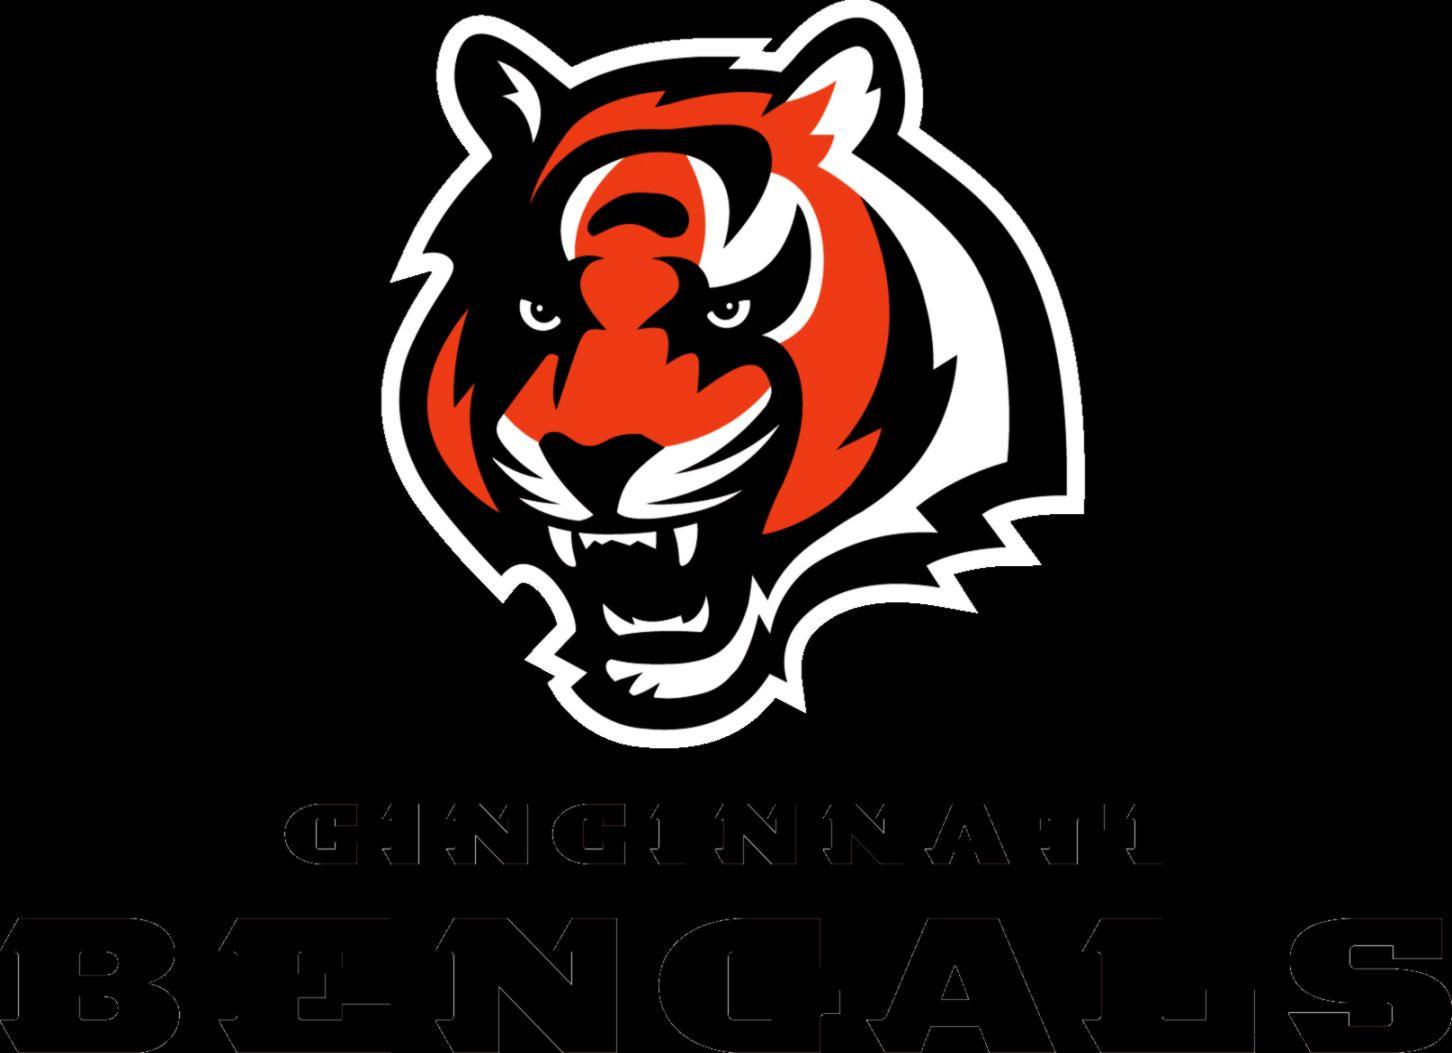 1000 images about Cincinnati Bengals on Pinterest  Cincinnati